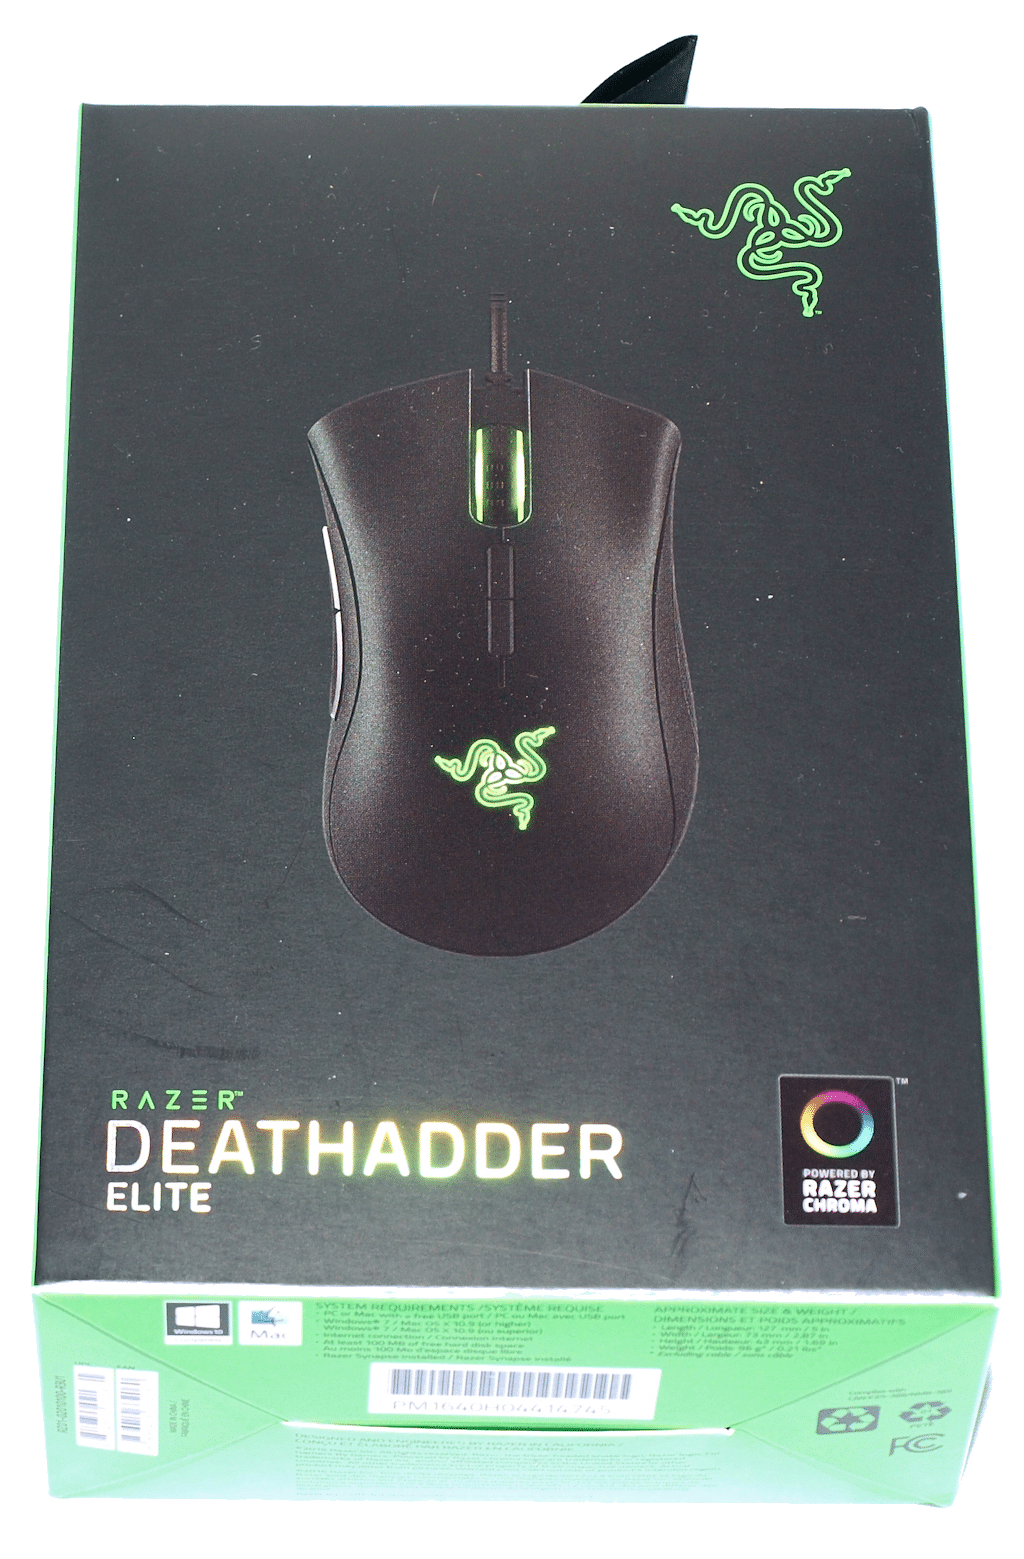 Razer Deathadder Elite Review The Deathadder Strikes Again Page 2 Of 3 Bjorn3d Com